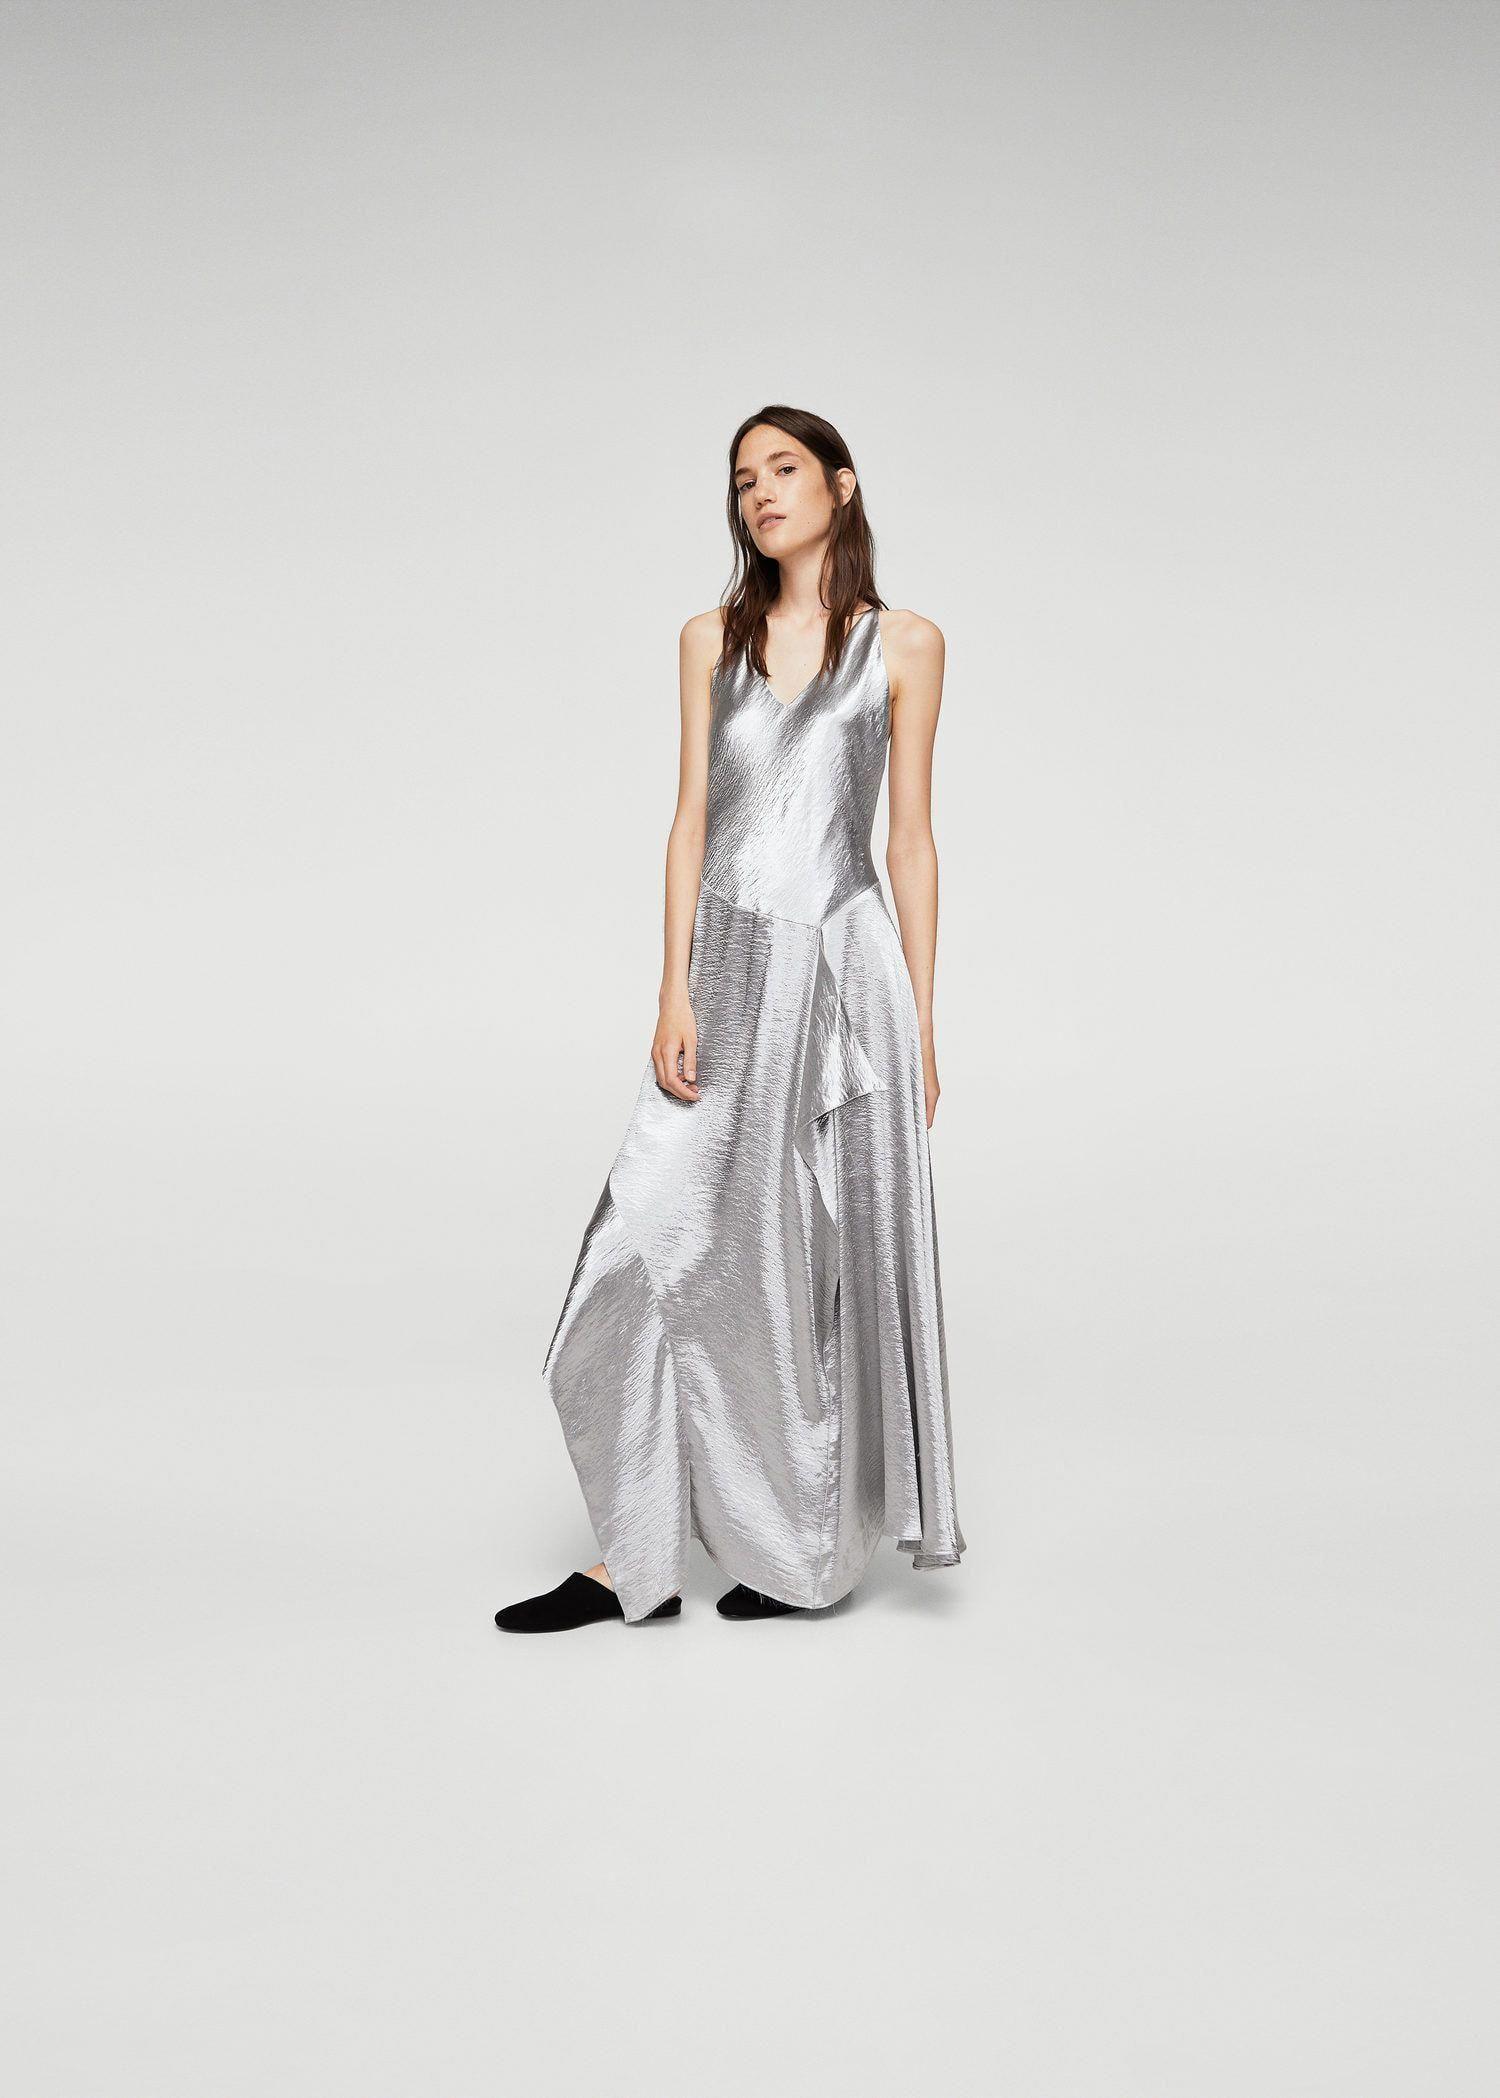 659811c2f05 Winter wedding guest dresses - CosmopolitanUK  womensfashionwinterwedding